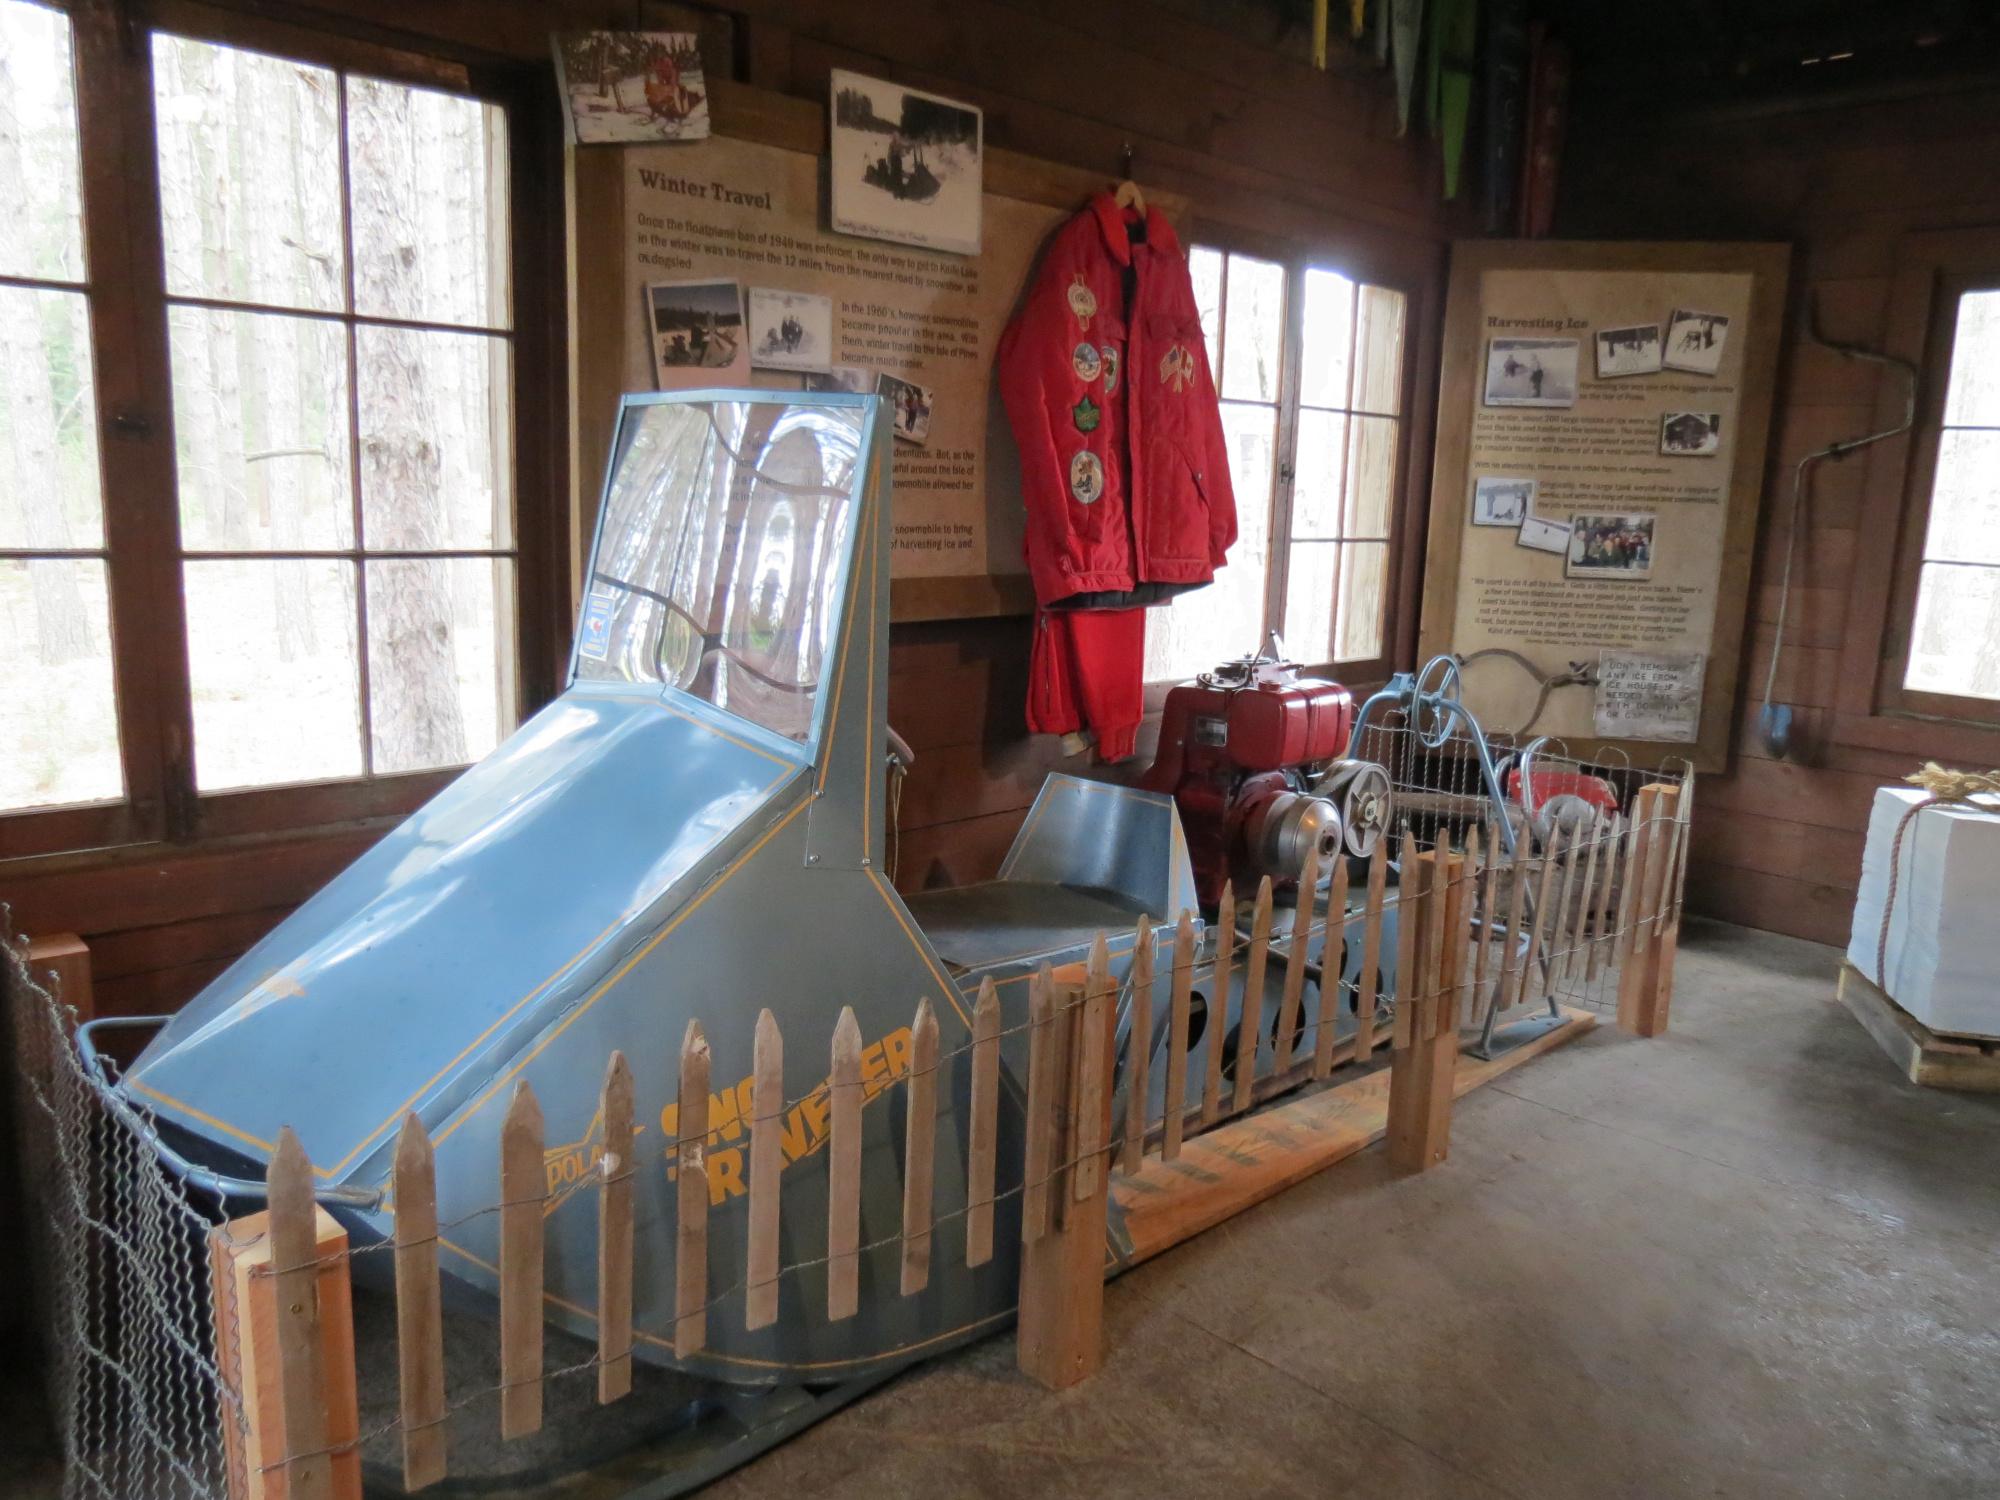 Winter Travel in Point Cabin